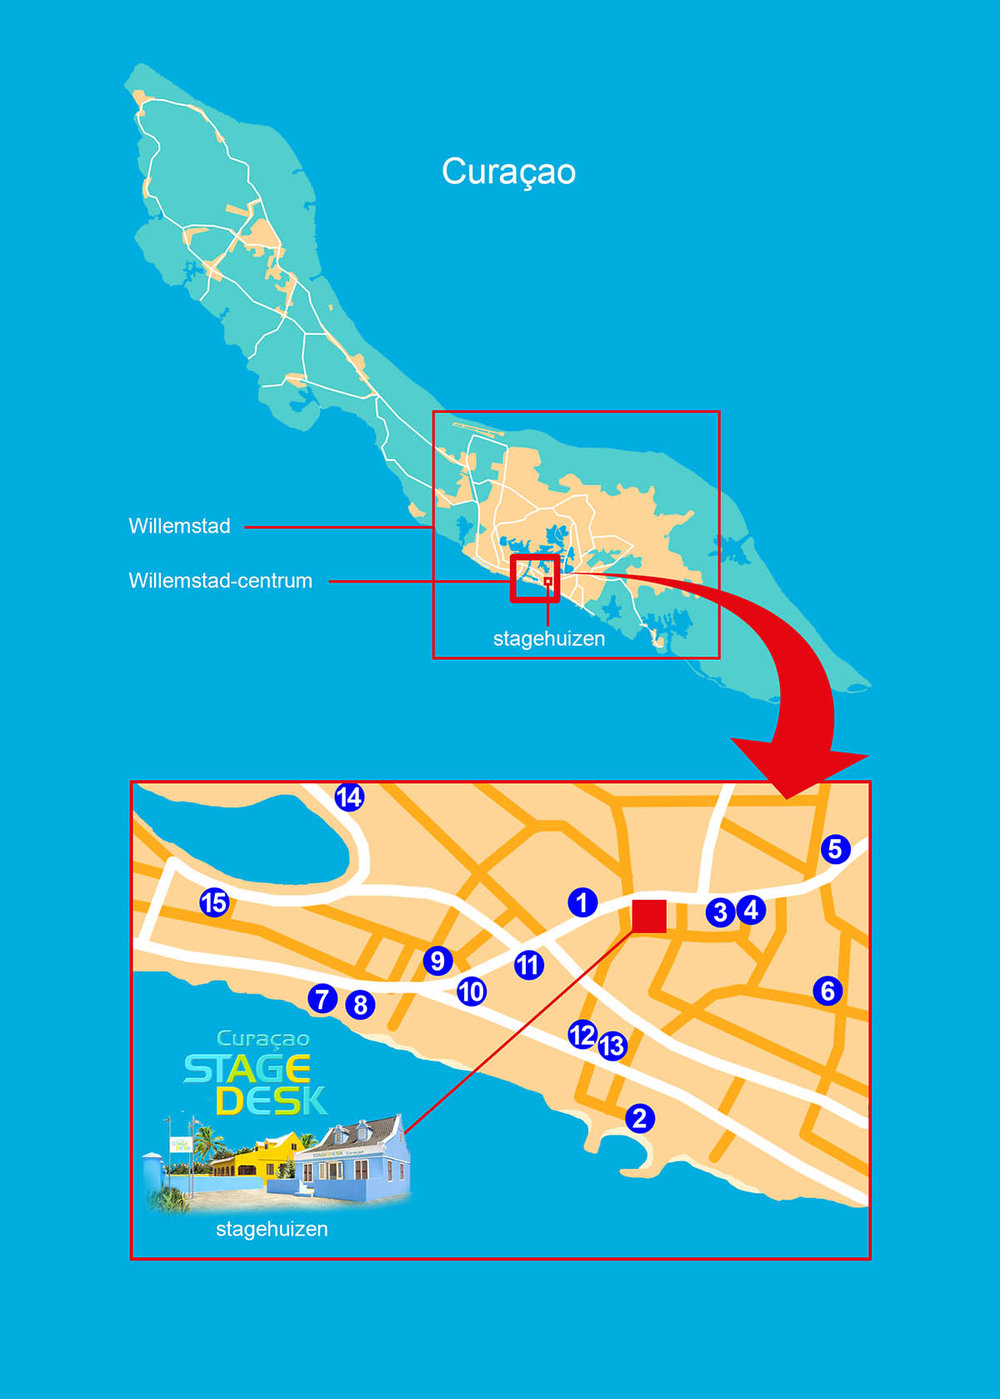 kaart-StageDesk-Curaçao-stagehuizen-ligging-2.jpg